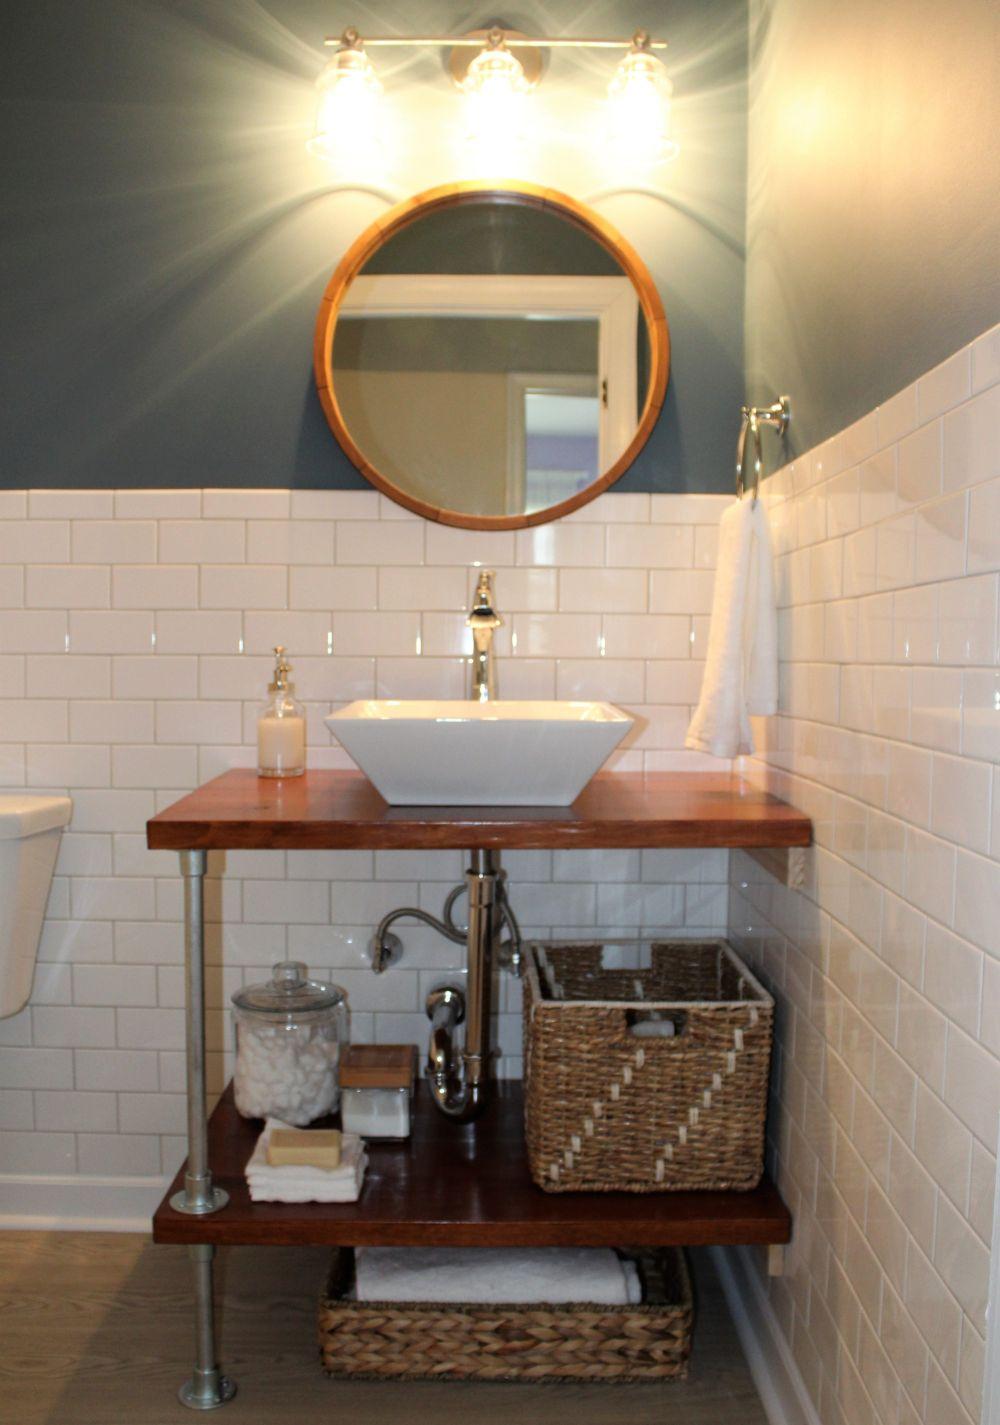 bathroom vanity designs diy bathroom vanity ideas perfect for repurposers UFDDYHW